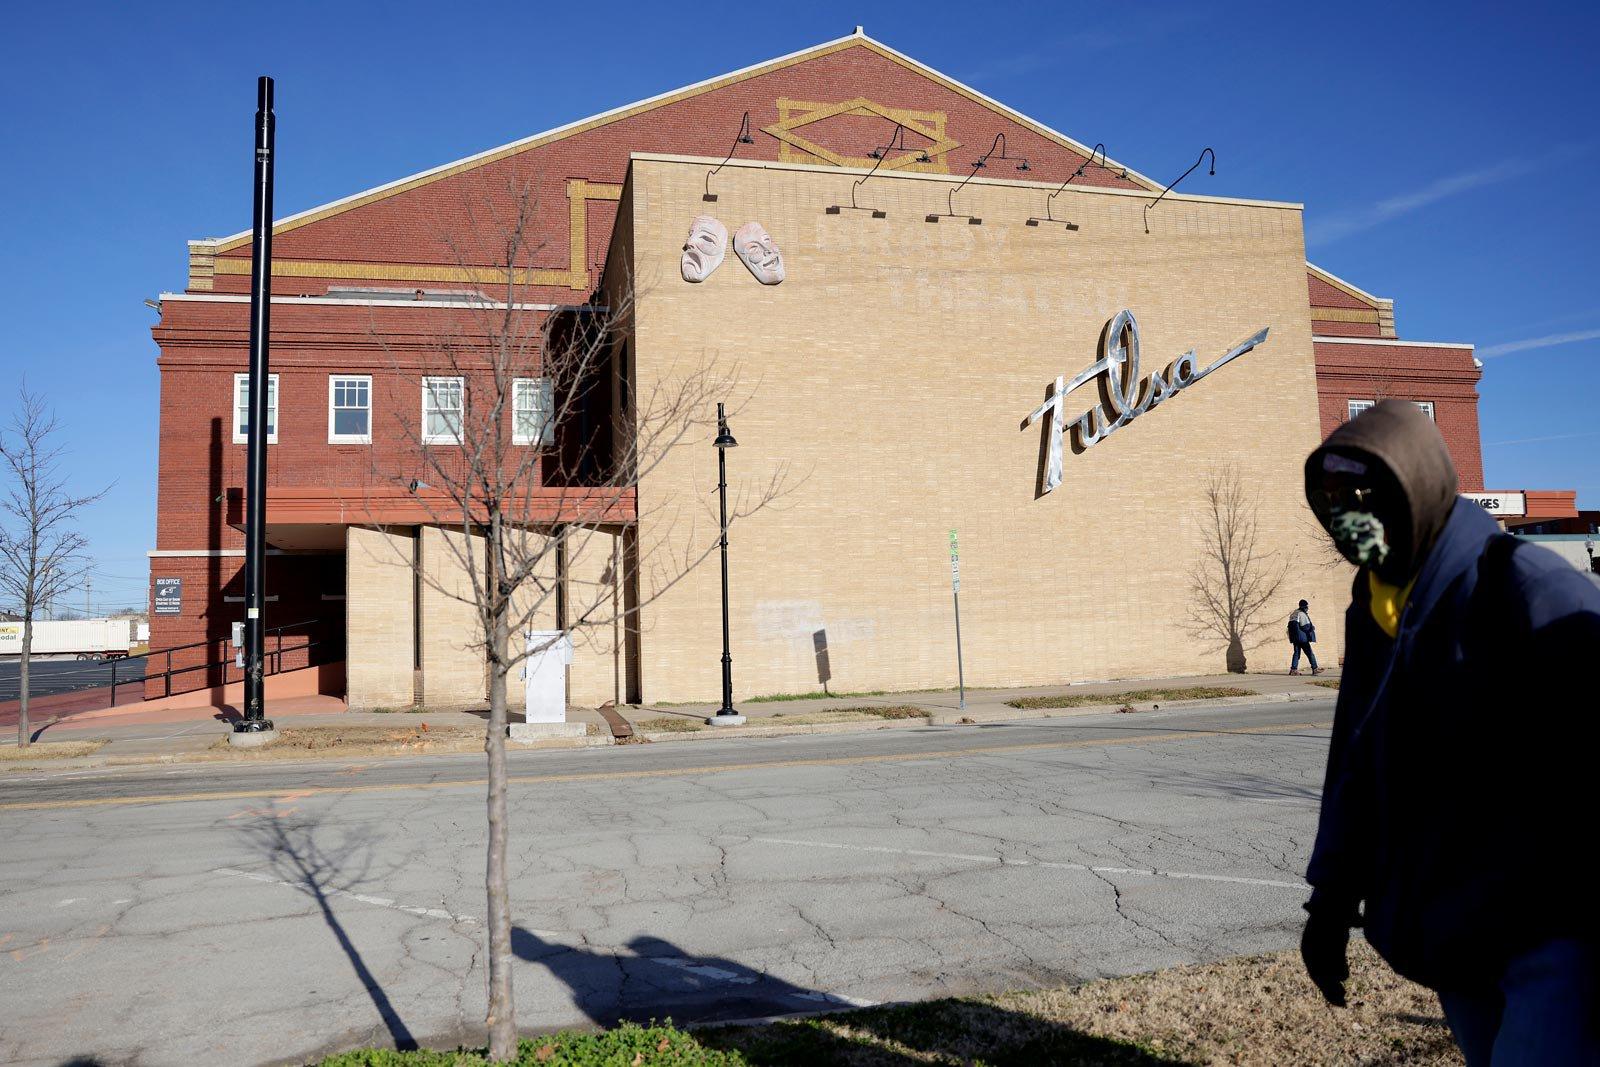 Greenwood-brady-or-Tulsa-theater-Now.jpg